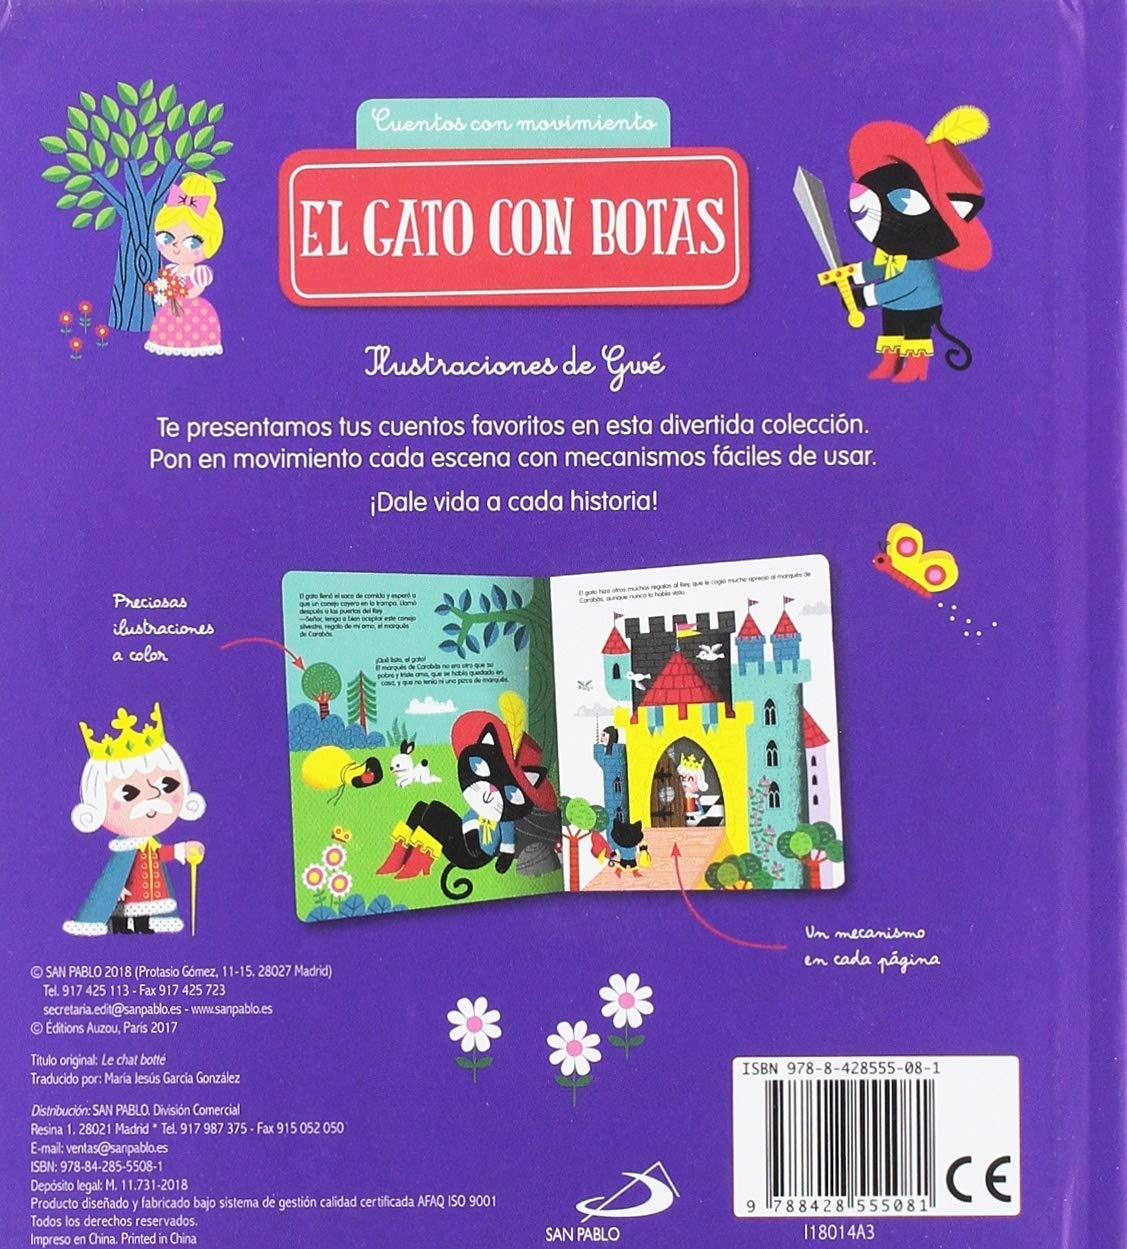 El gato con botas: VV.AA.: 9788428555081: Amazon.com: Books